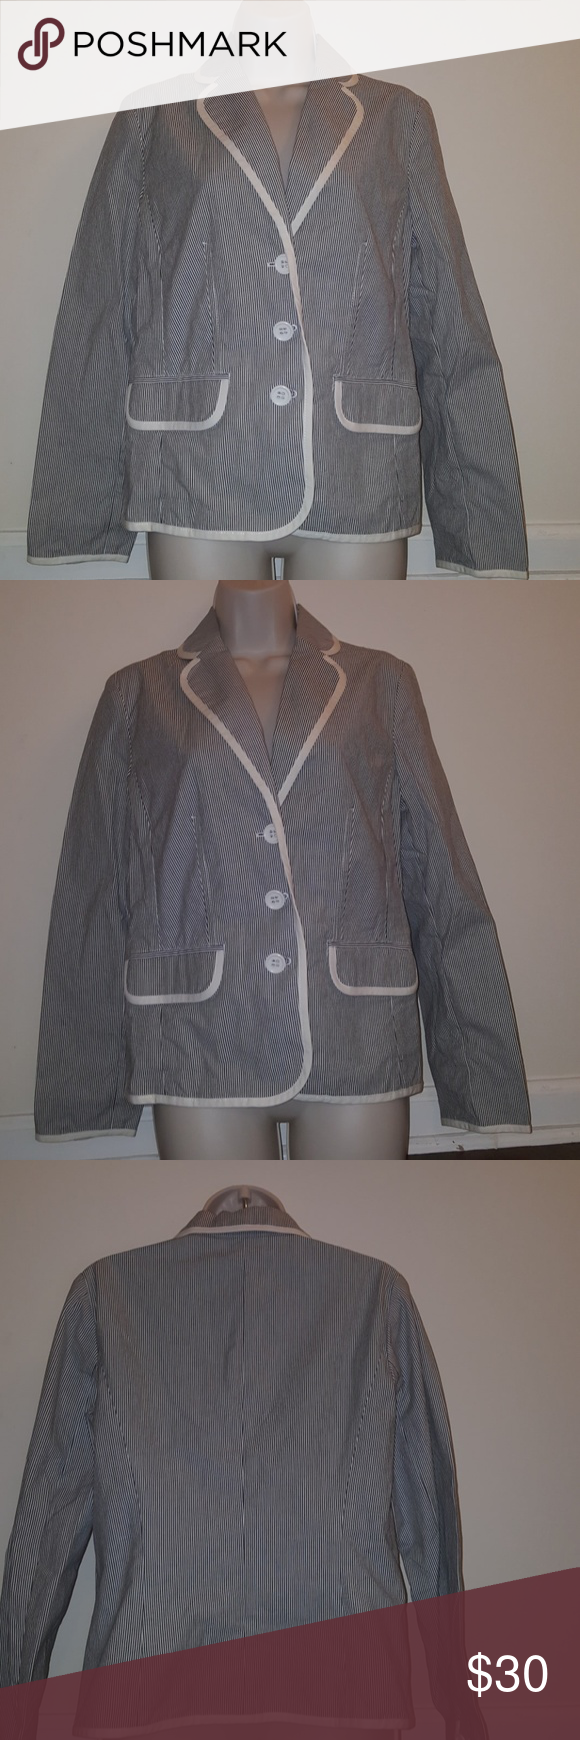 Liz Claiborne  Ladies Cotton Stripe Knit  Jacket Stripe  Front Deep Pockets Liz Claiborne Jackets & Coats